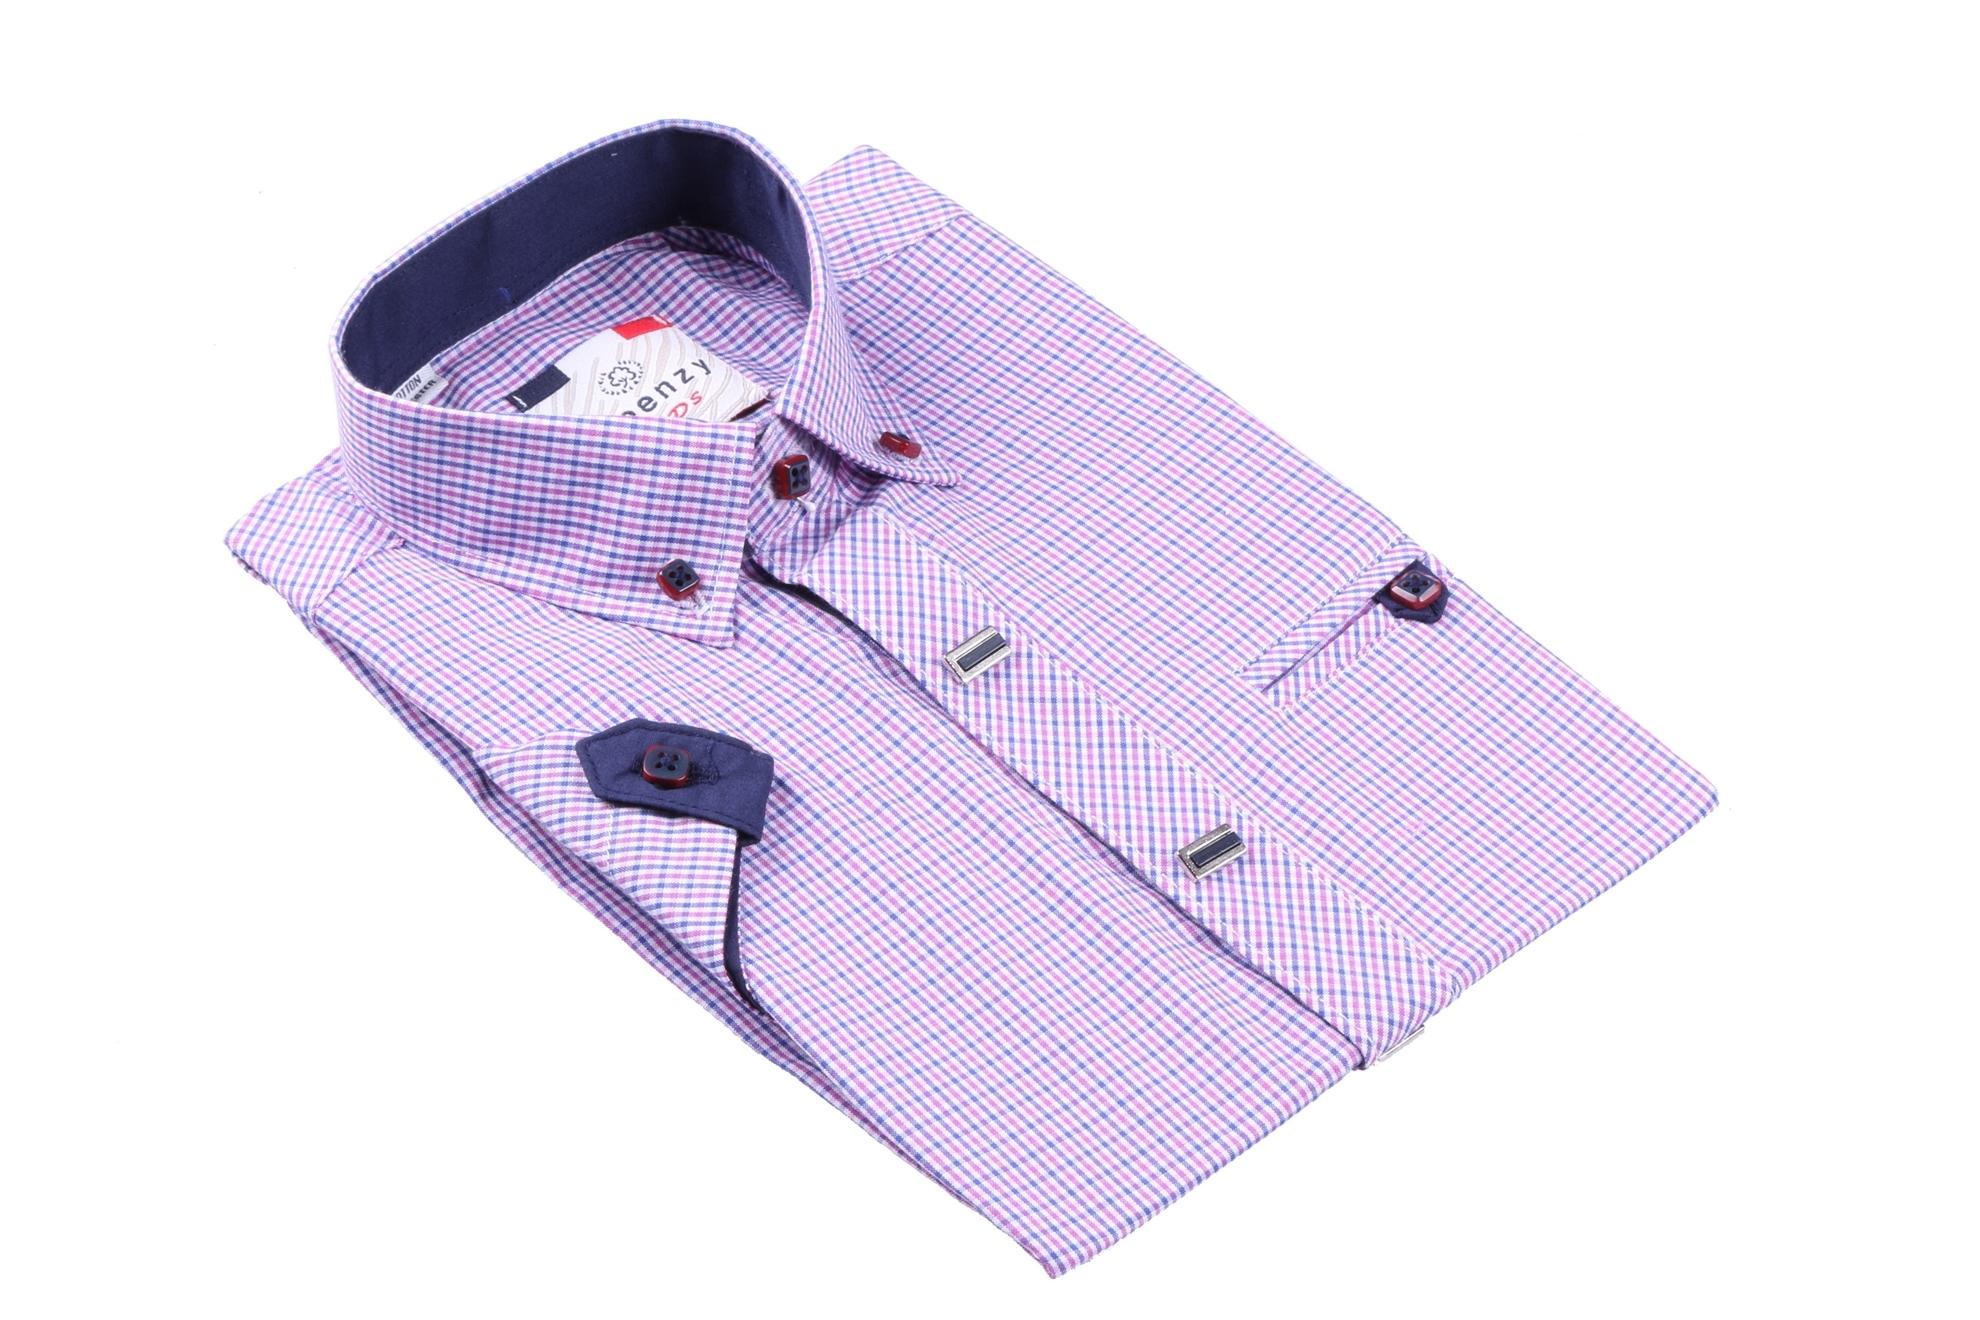 Детская рубашка с коротким рукавом (Арт. B SKY 2499K)